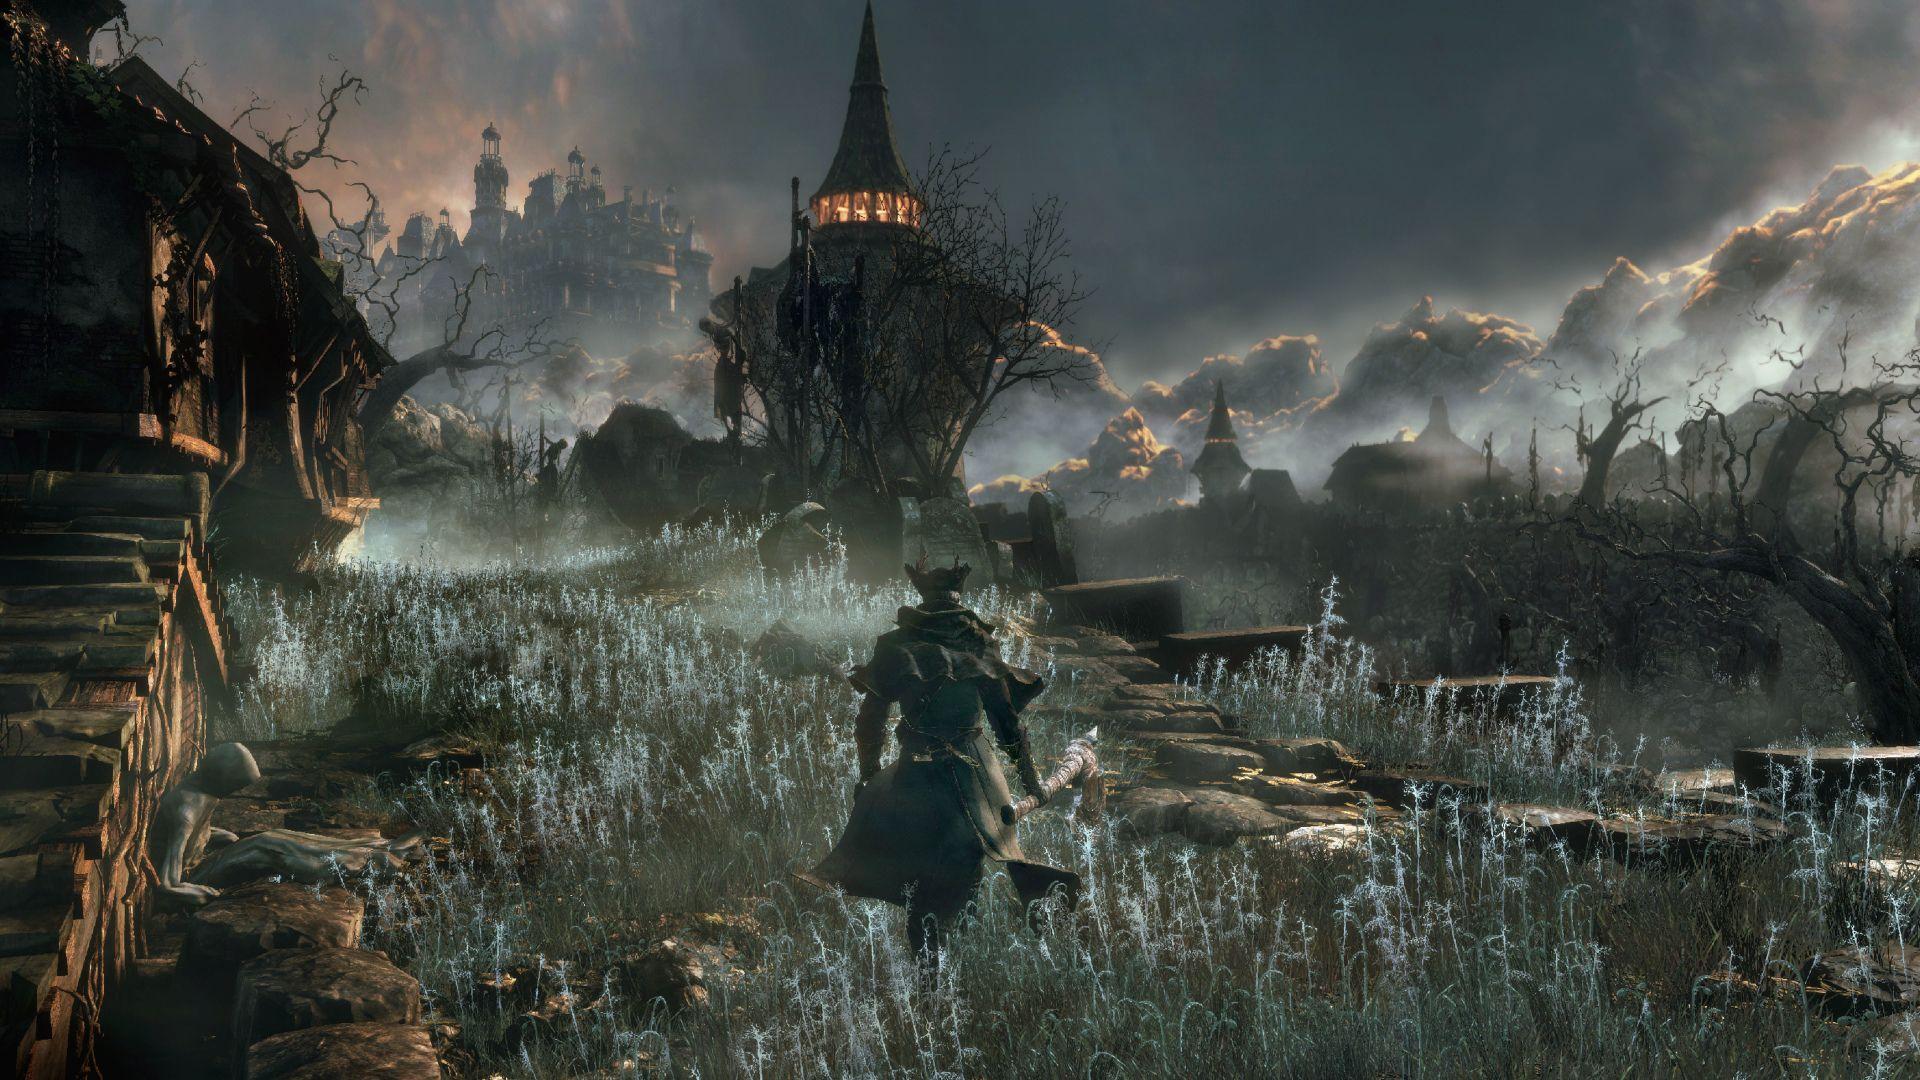 Jeux Video Bloodborne Fond D Ecran Dark Souls Bloodborne Fond Ecran